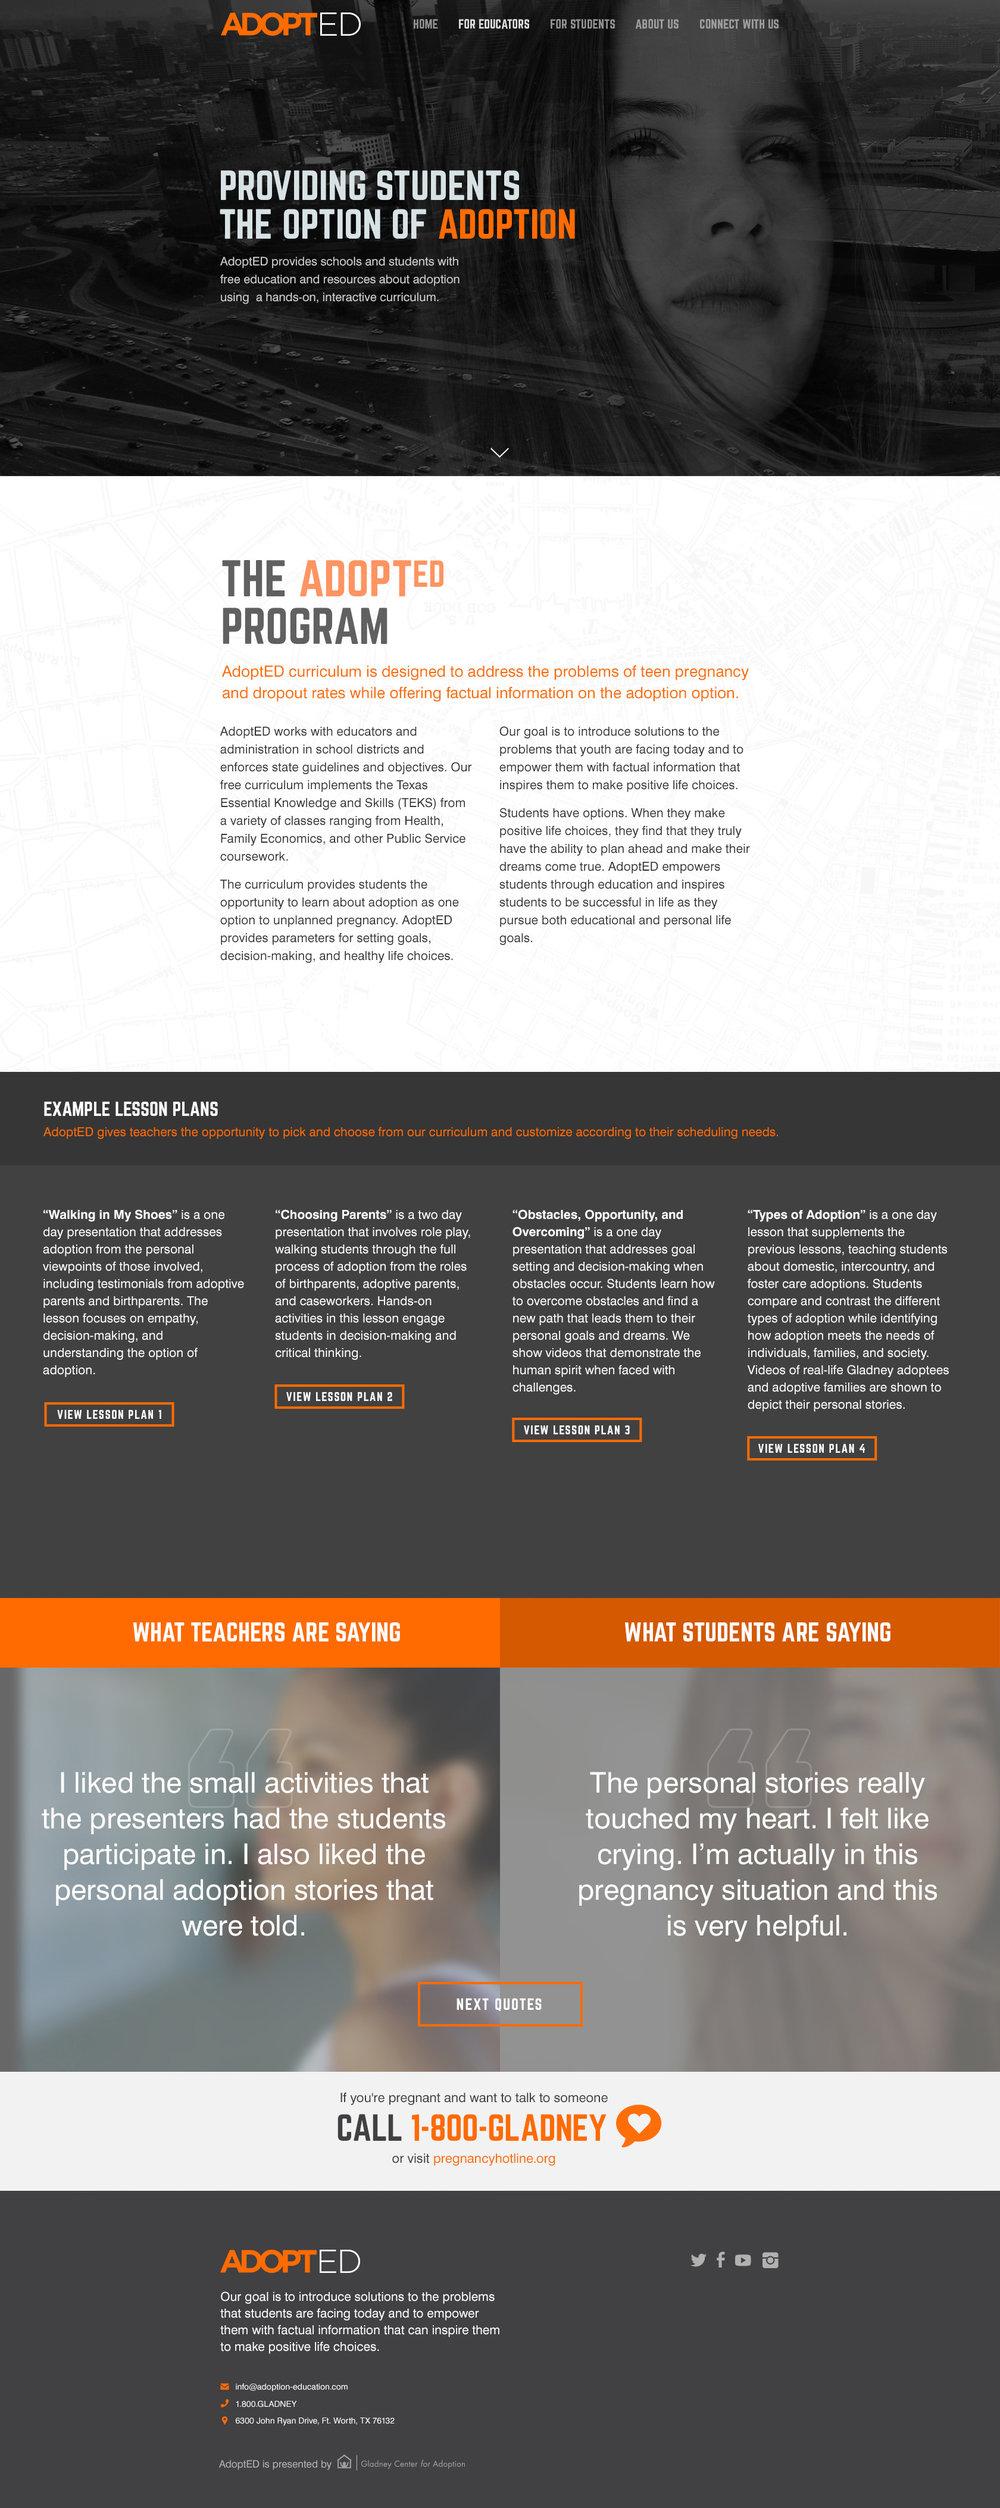 AdoptEd-Web-UI-Large-R6b-Educators.jpg